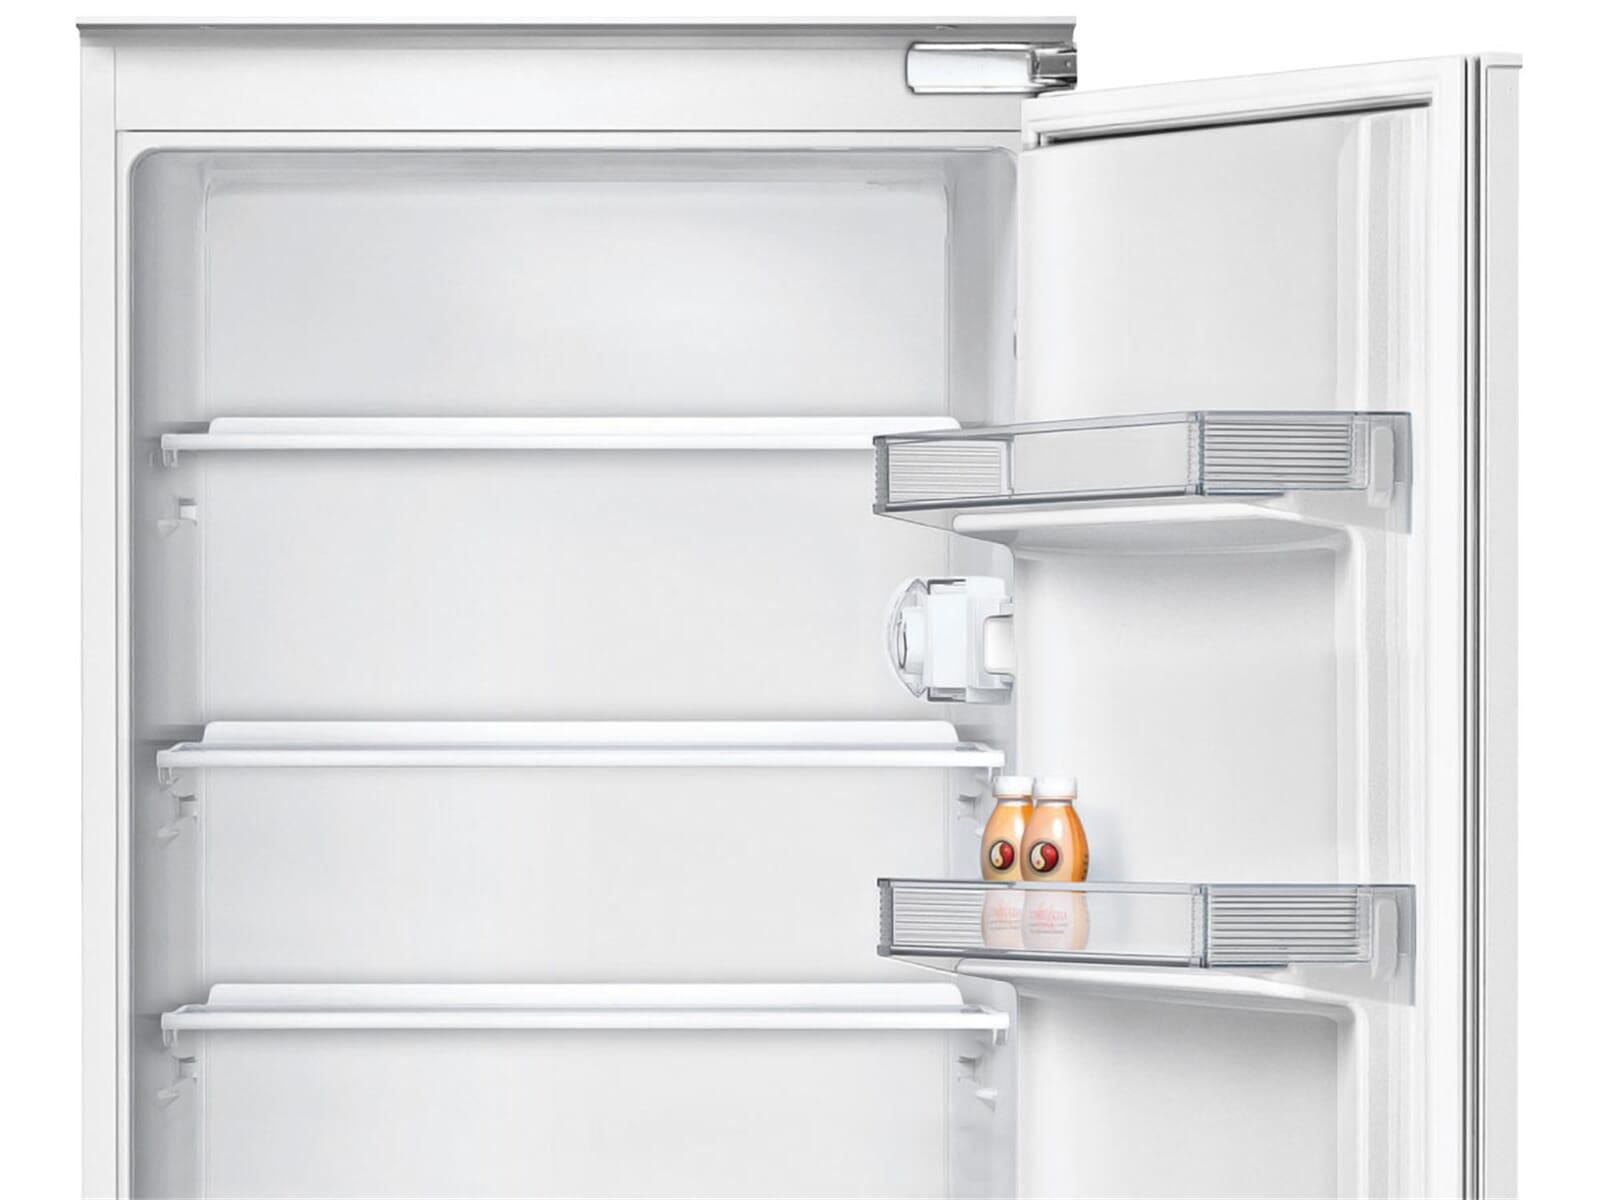 Neff K 415 A1 Einbaukühlschrank